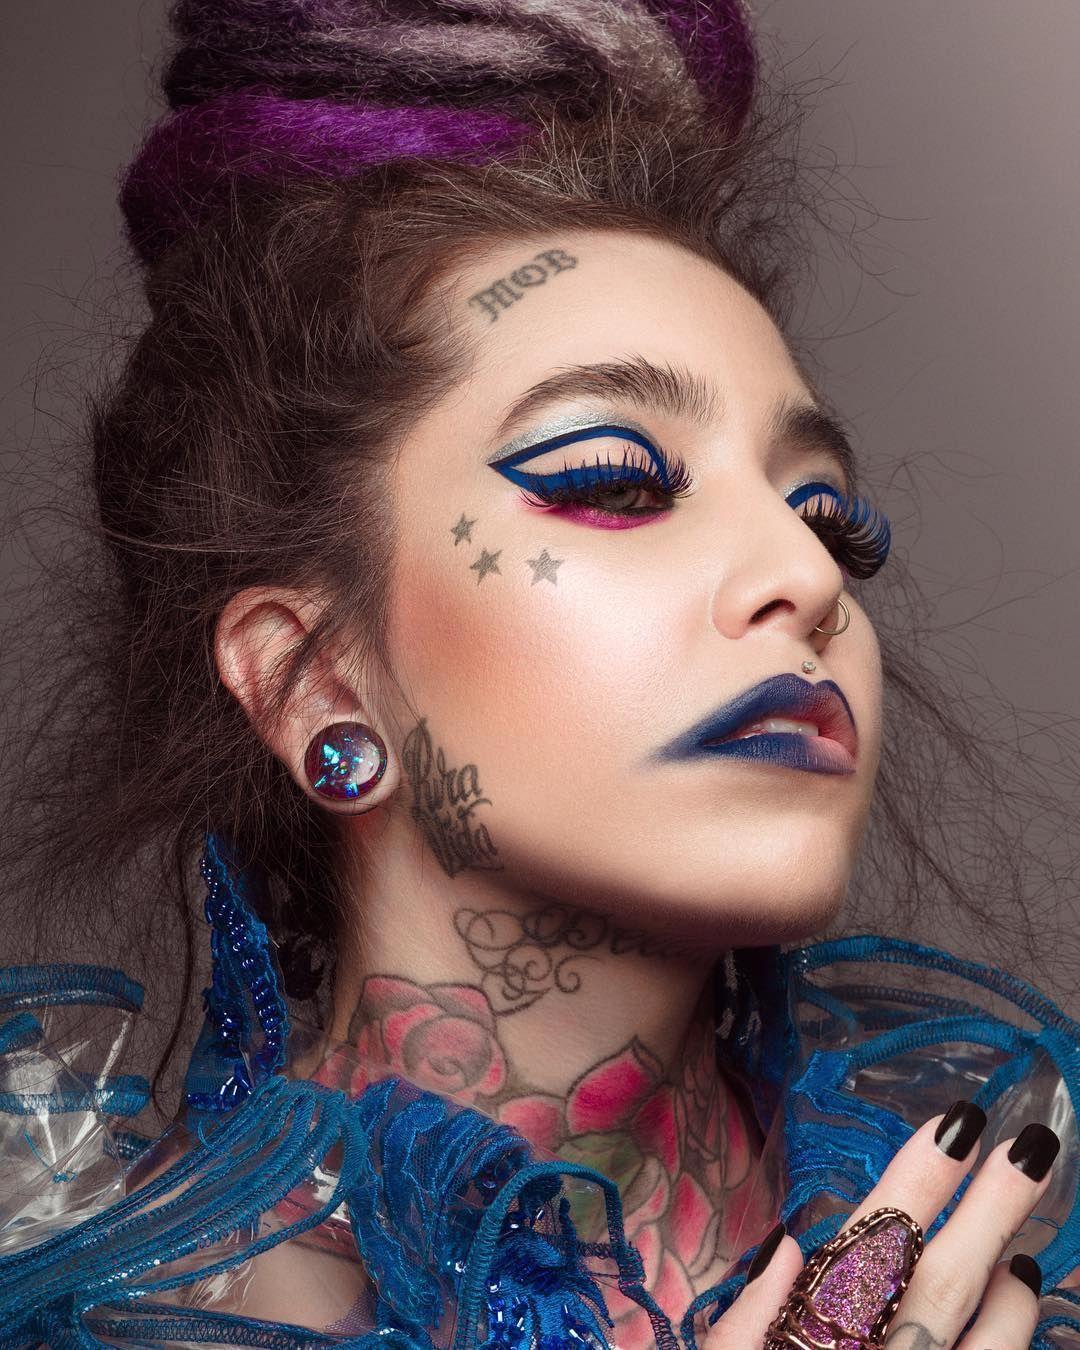 Makeup Designory (makeupdesignory) • Instagram photos